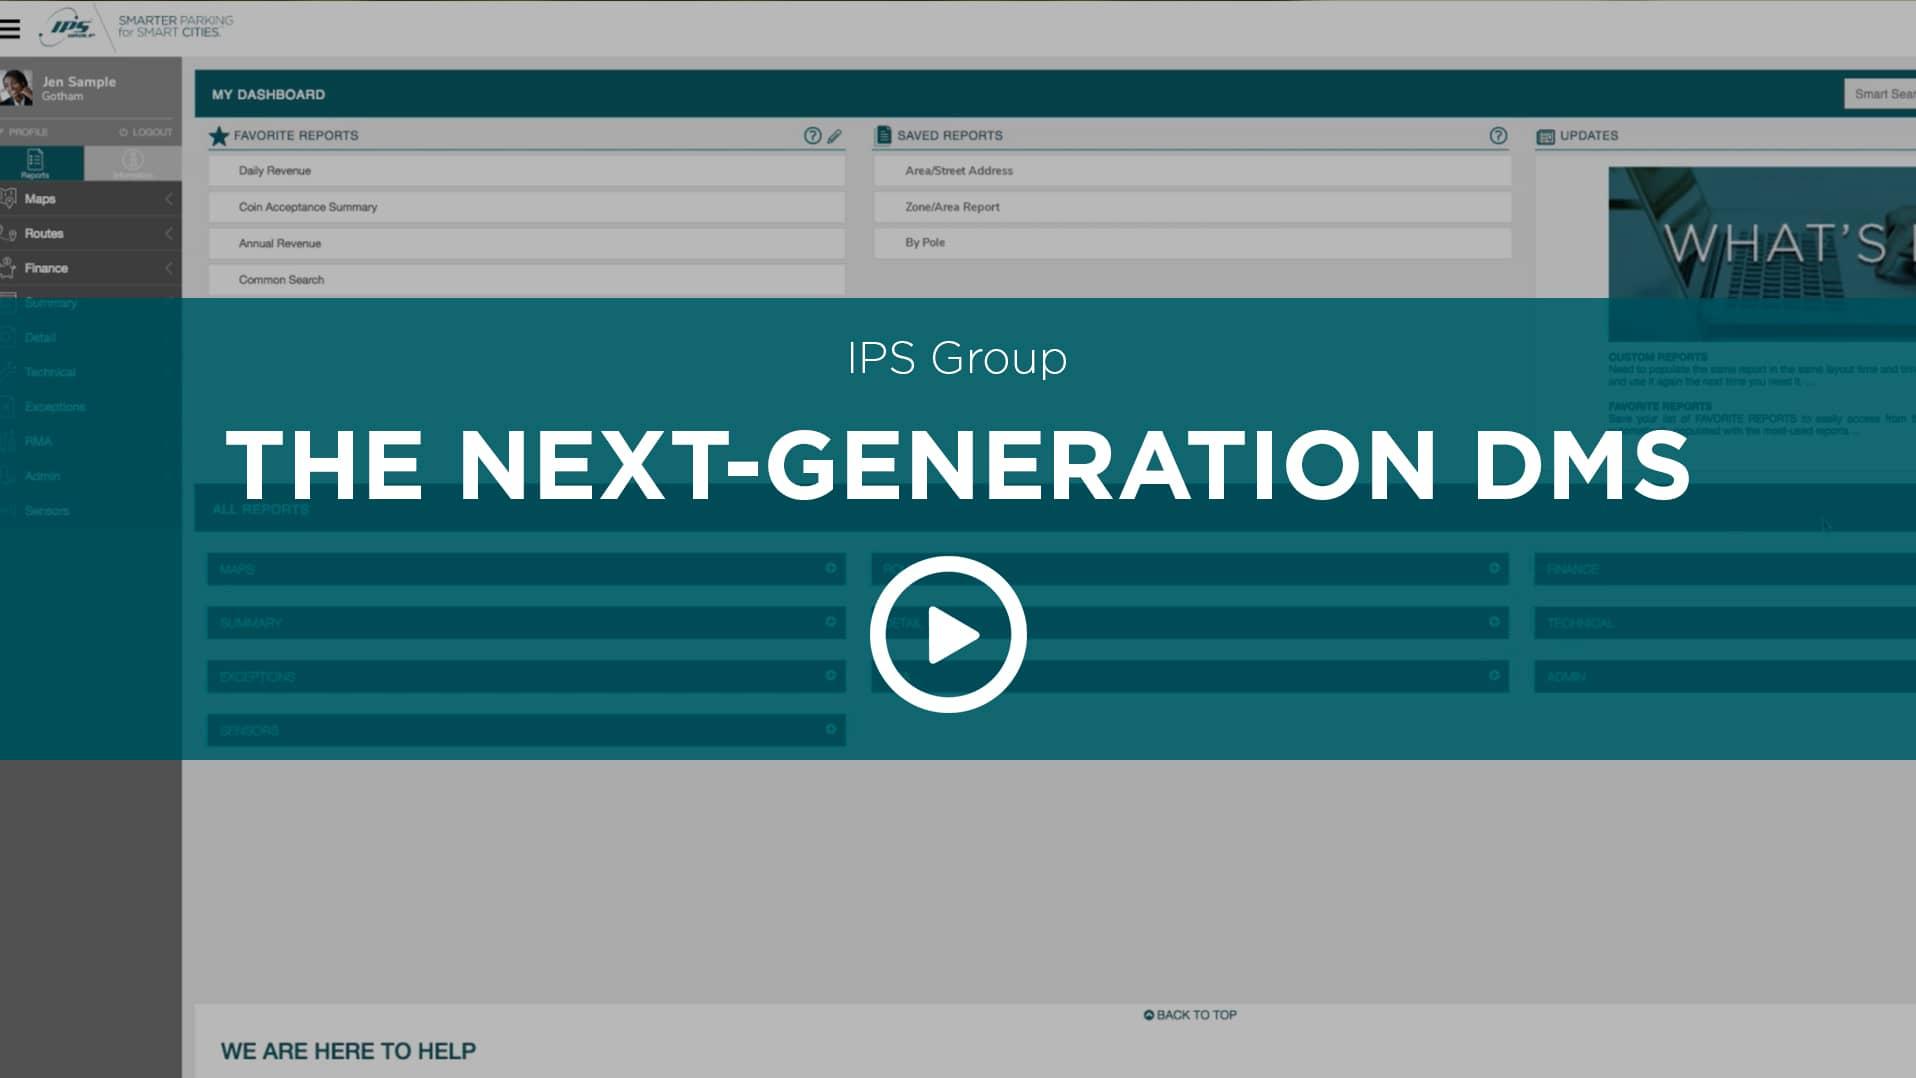 Next Generation DMS